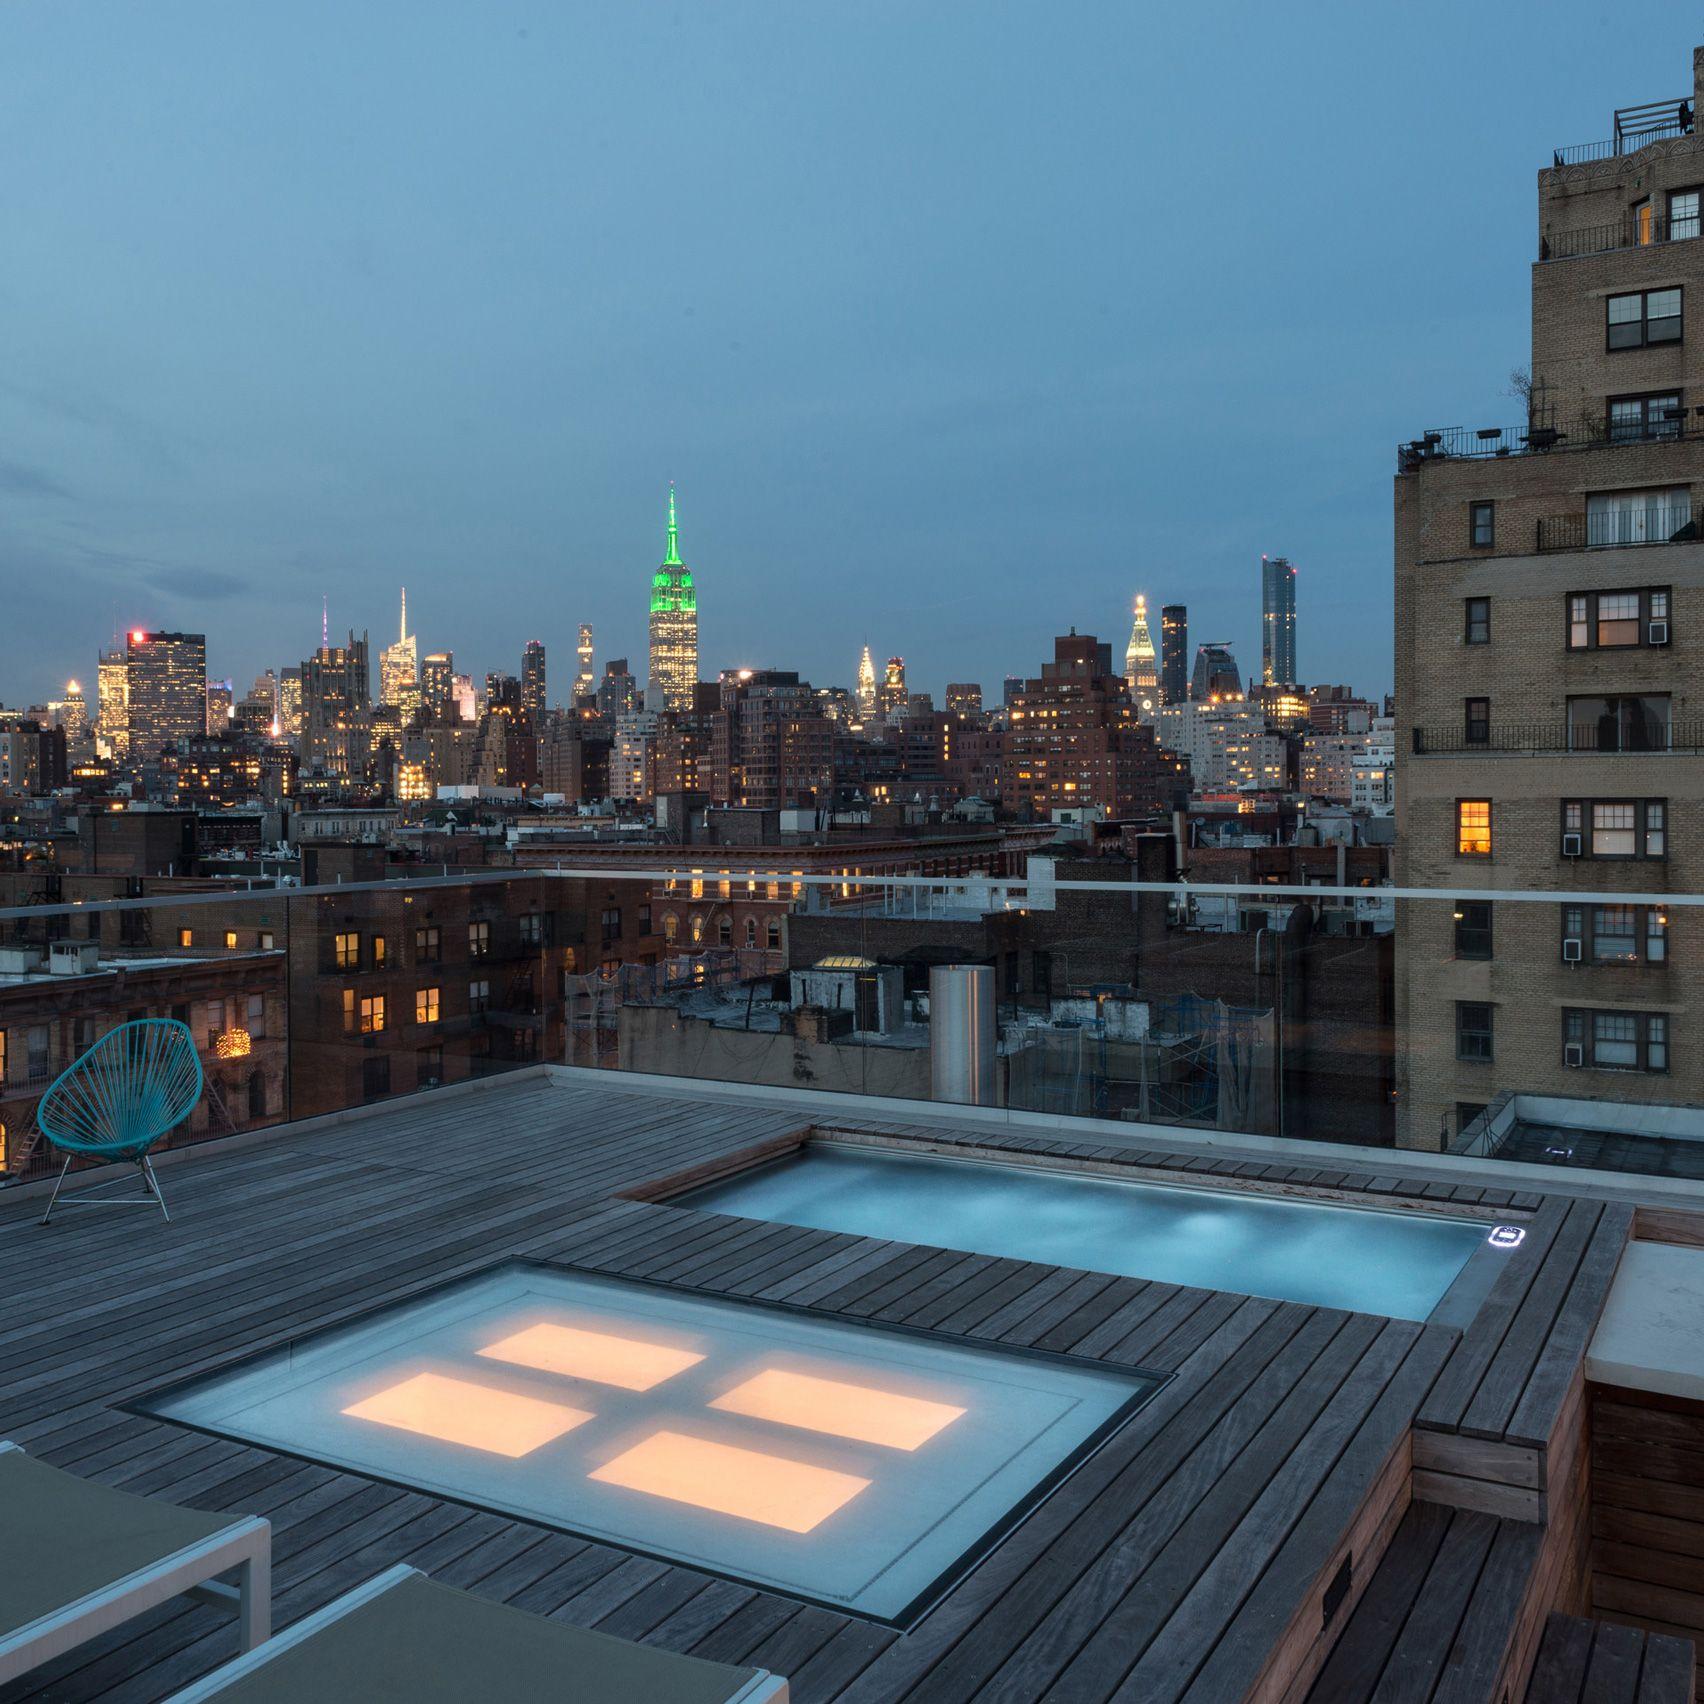 Manhattan New York Studio Apartments: Design Studio TBD Has Transformed An Apartment In